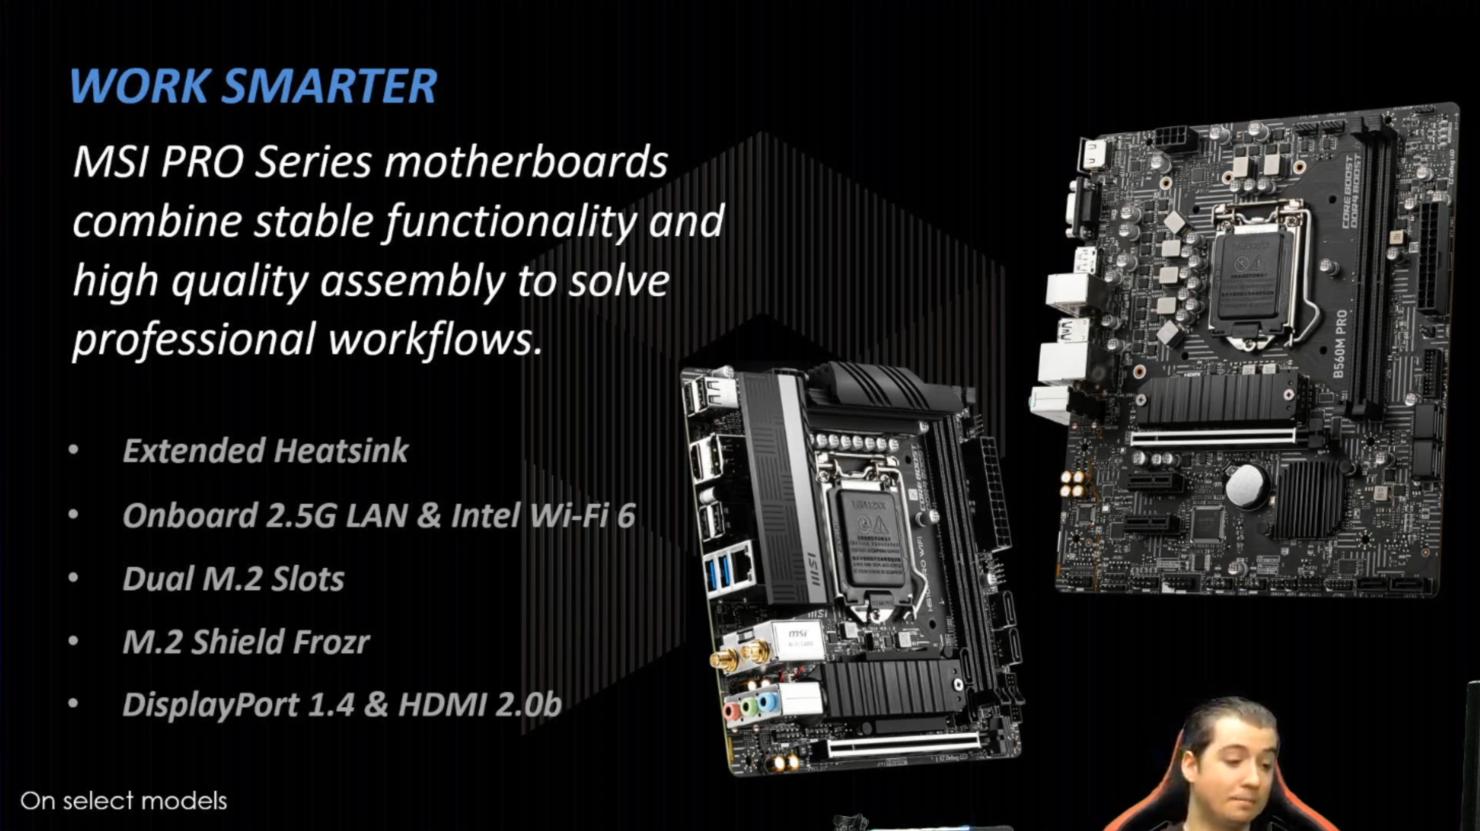 msi-b560-h510-motherboards-intel-10th-gen-11th-gen-desktop-cpus-_-prices-specs-_7